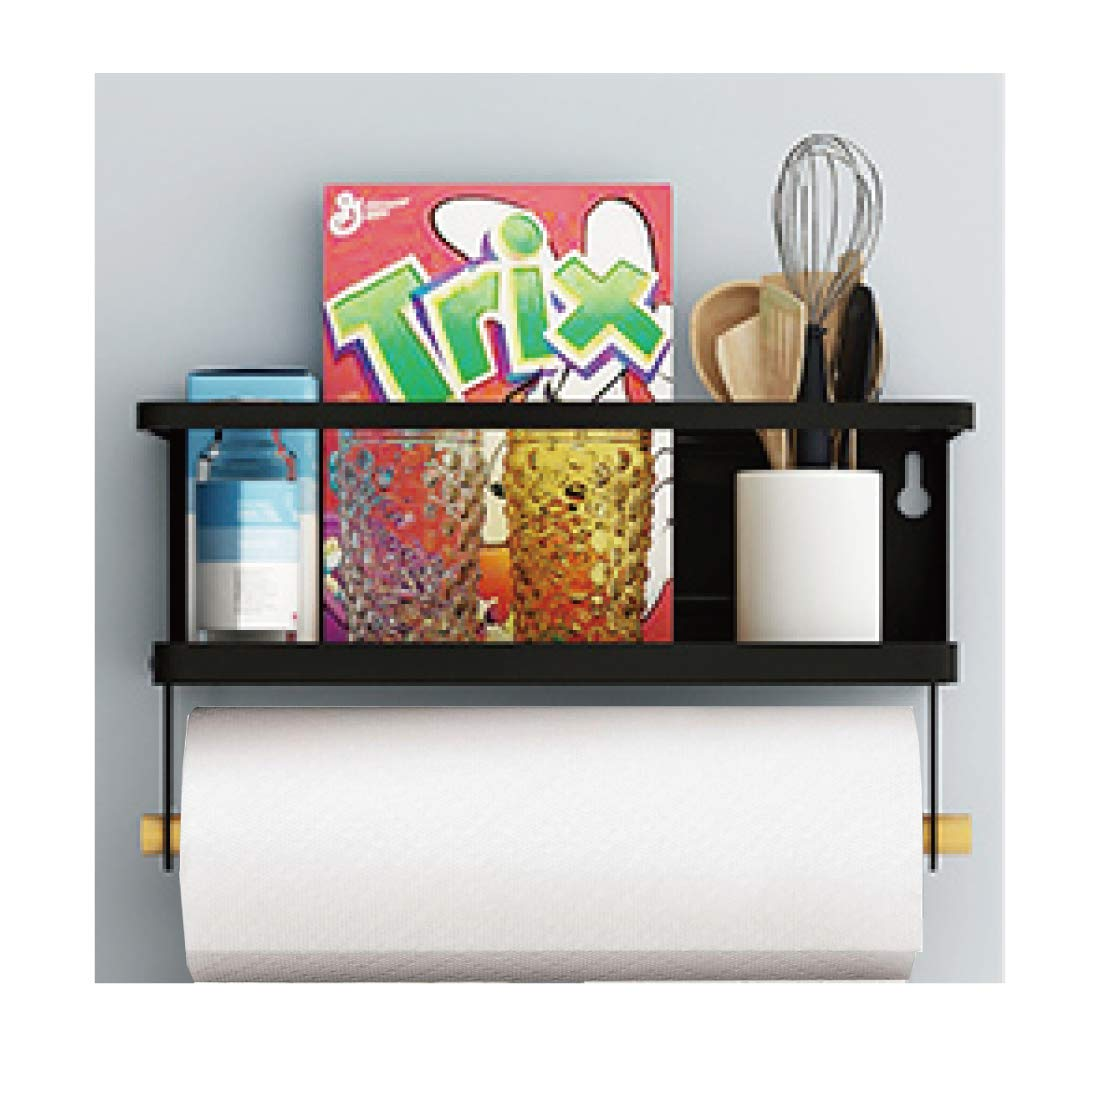 Refrigerator Spice Rack Organizer Single Tier Magnetic Fridge Spice Storage with Paper Towel Holder (BLACK)